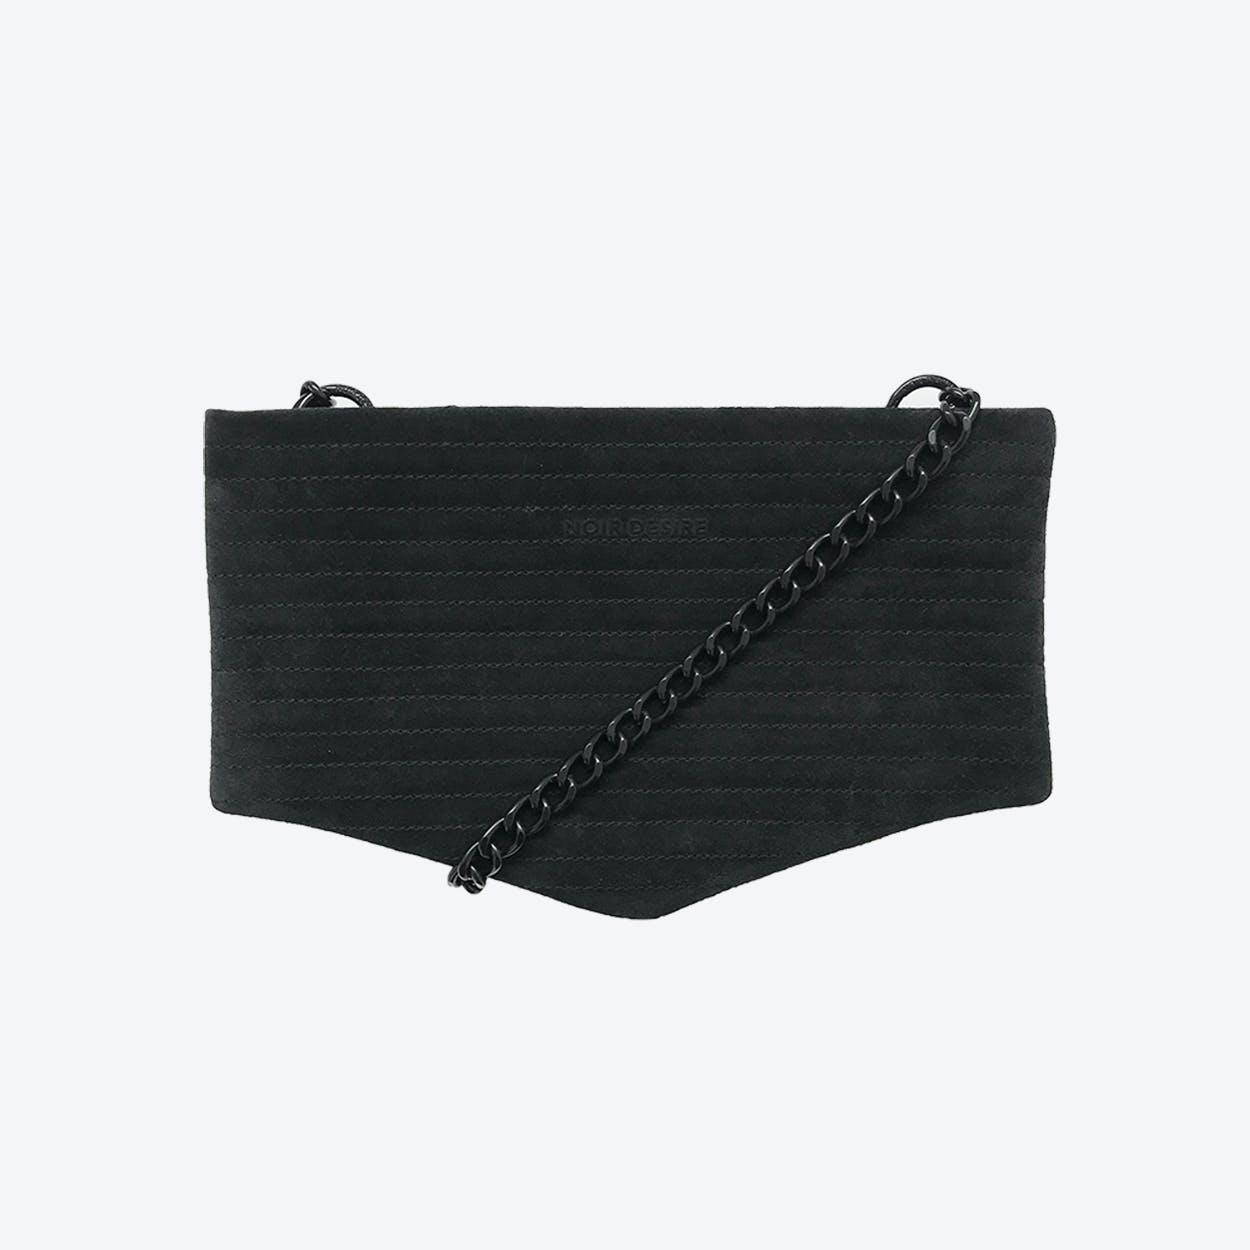 ND Bag #5 - 3-in-1 Suede Bag